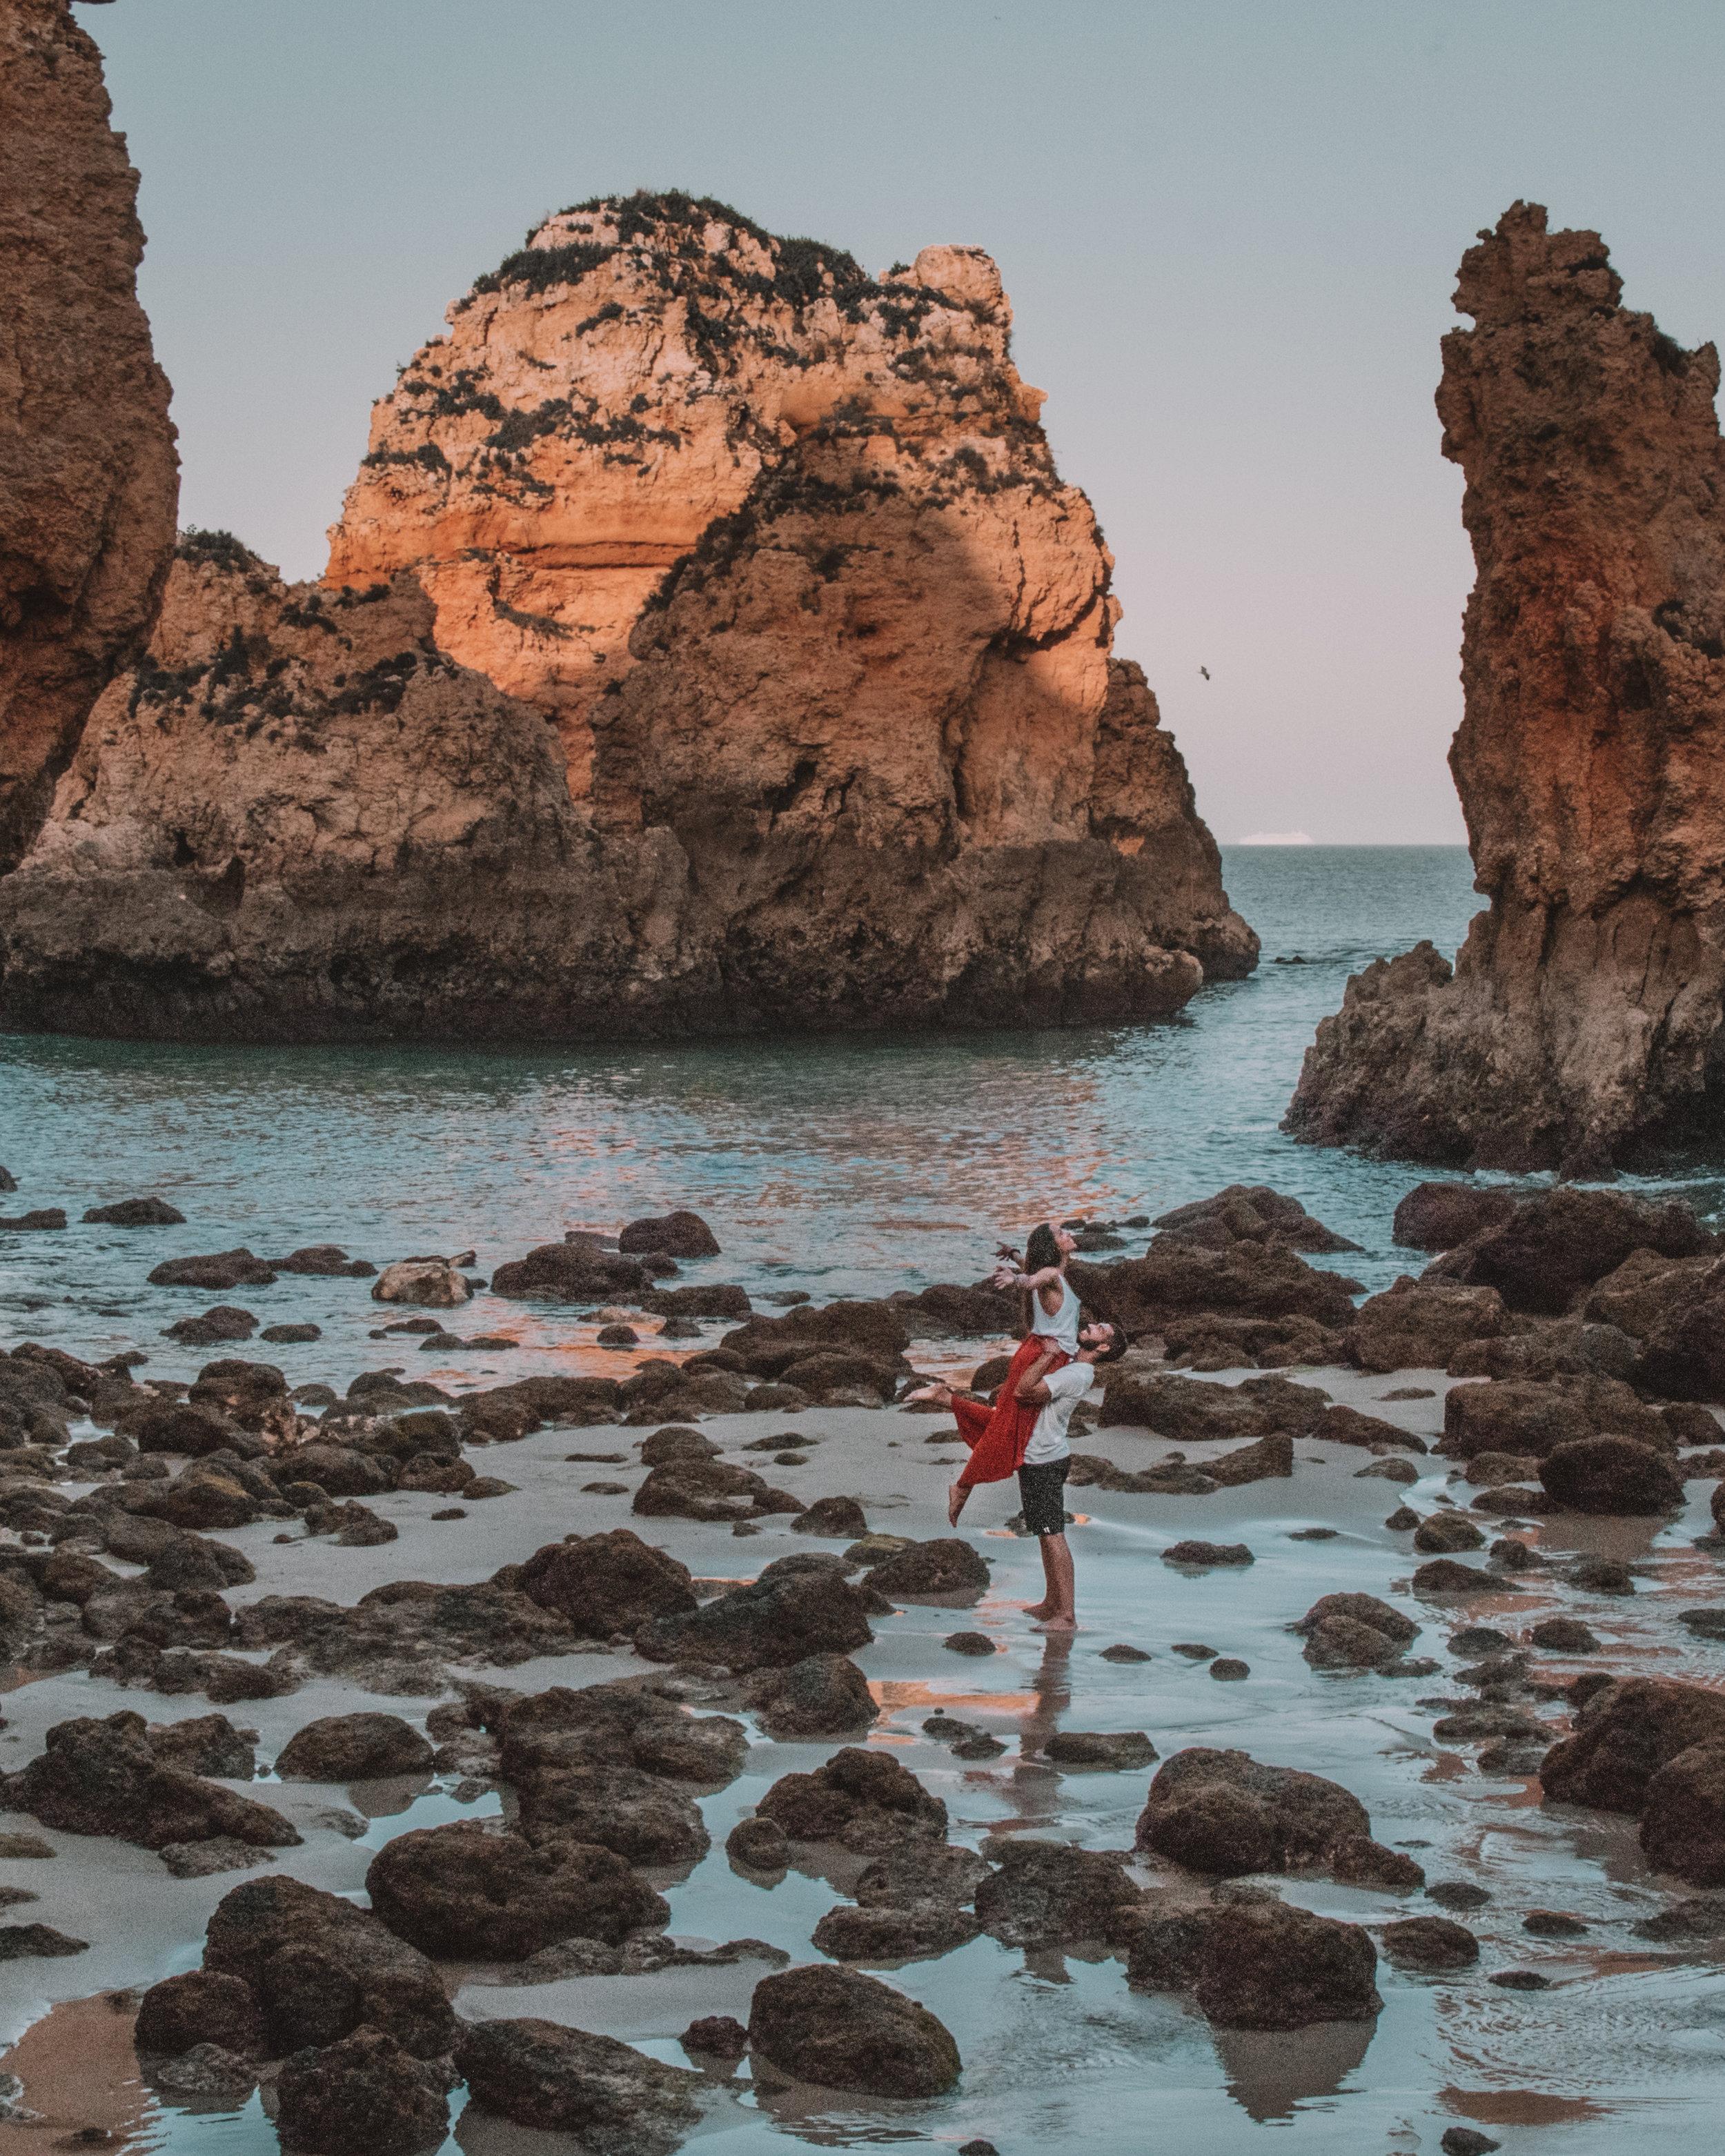 freeoversea algarve secret places travel couple explore best beaches sea sandy sunset photography blog